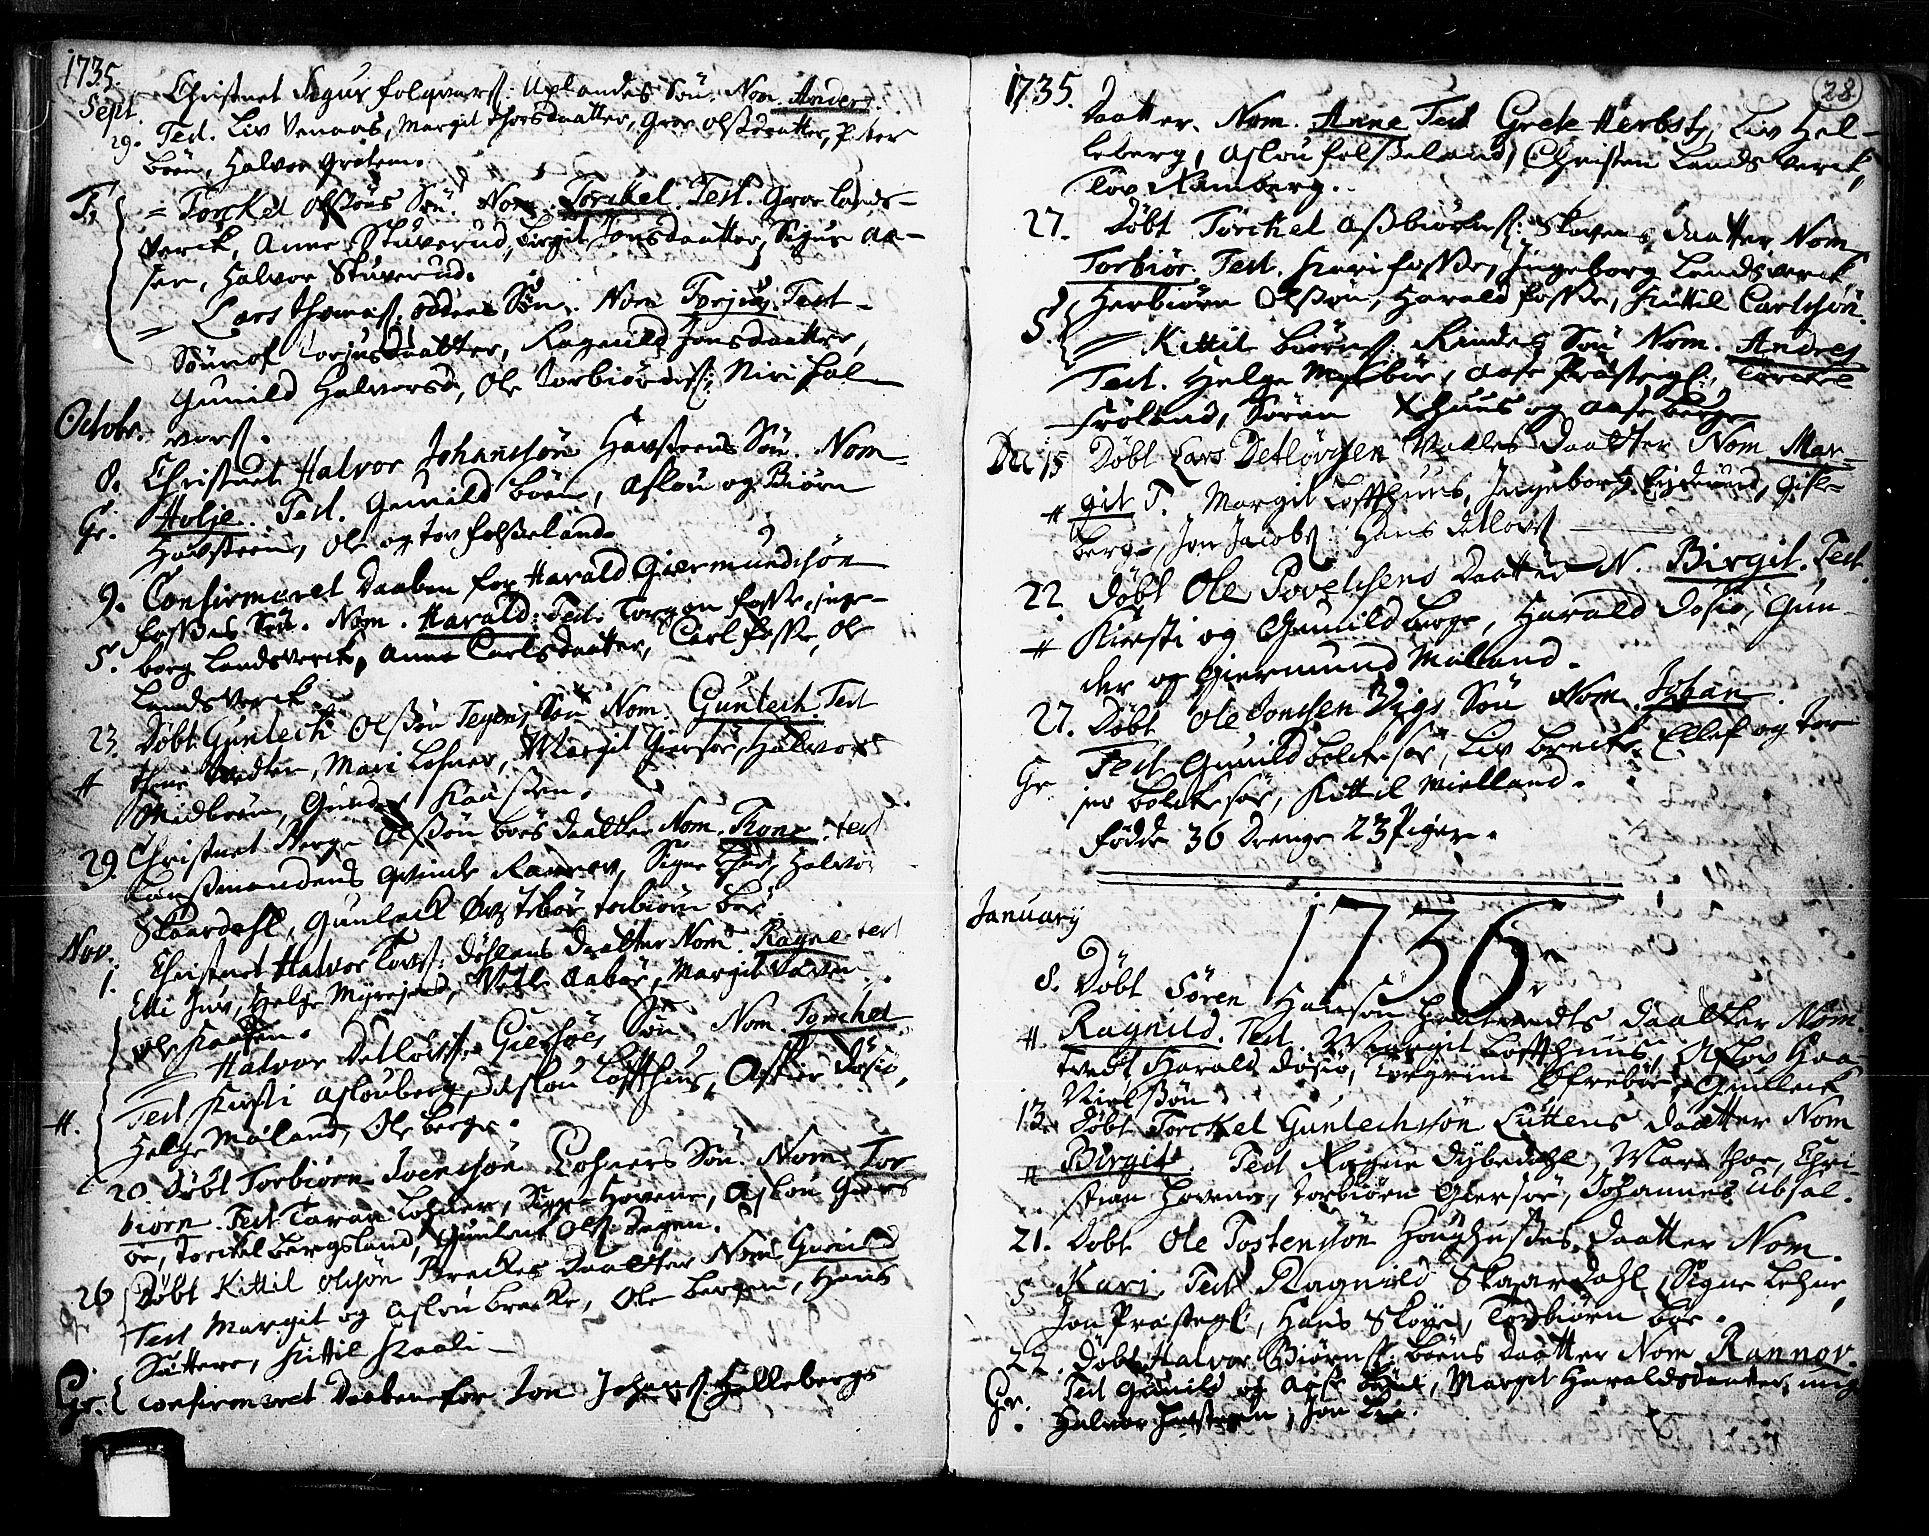 SAKO, Hjartdal kirkebøker, F/Fa/L0003: Ministerialbok nr. I 3, 1727-1775, s. 28